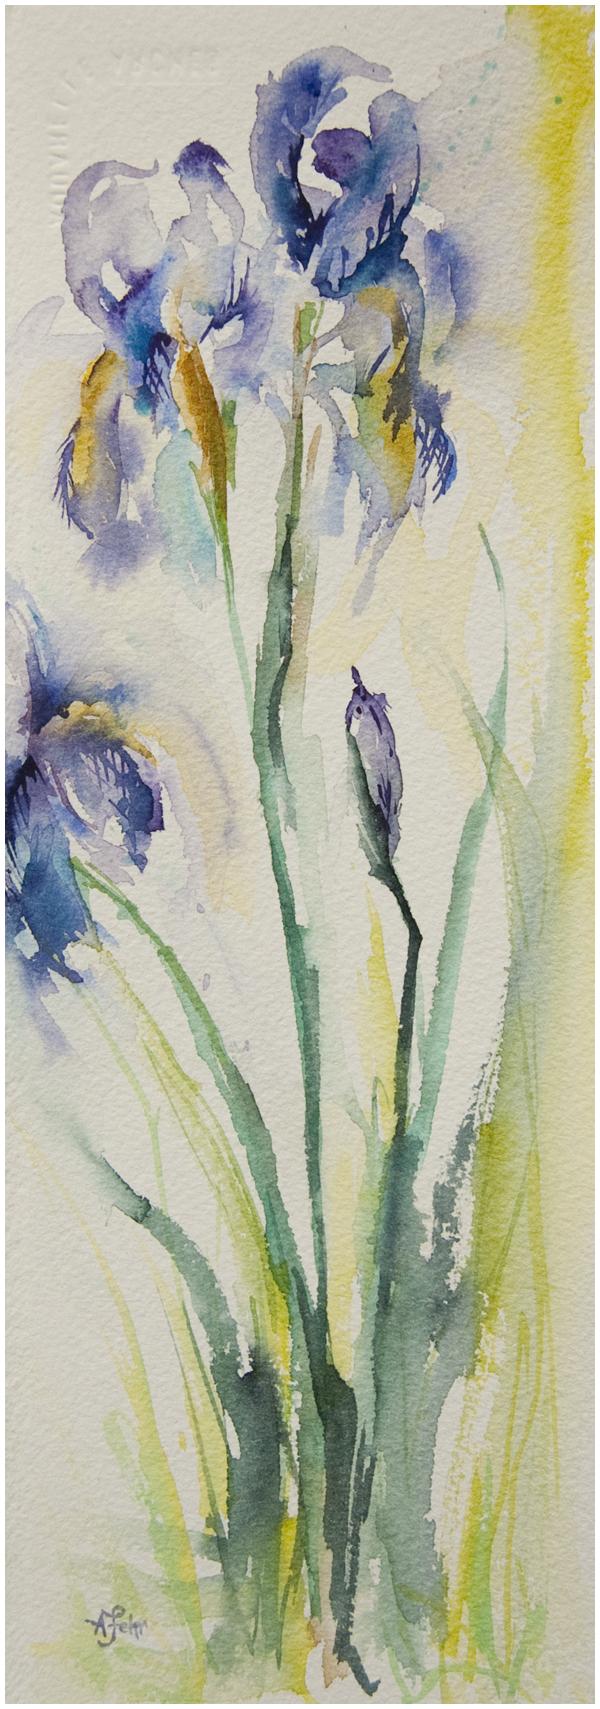 irises-600w.jpg